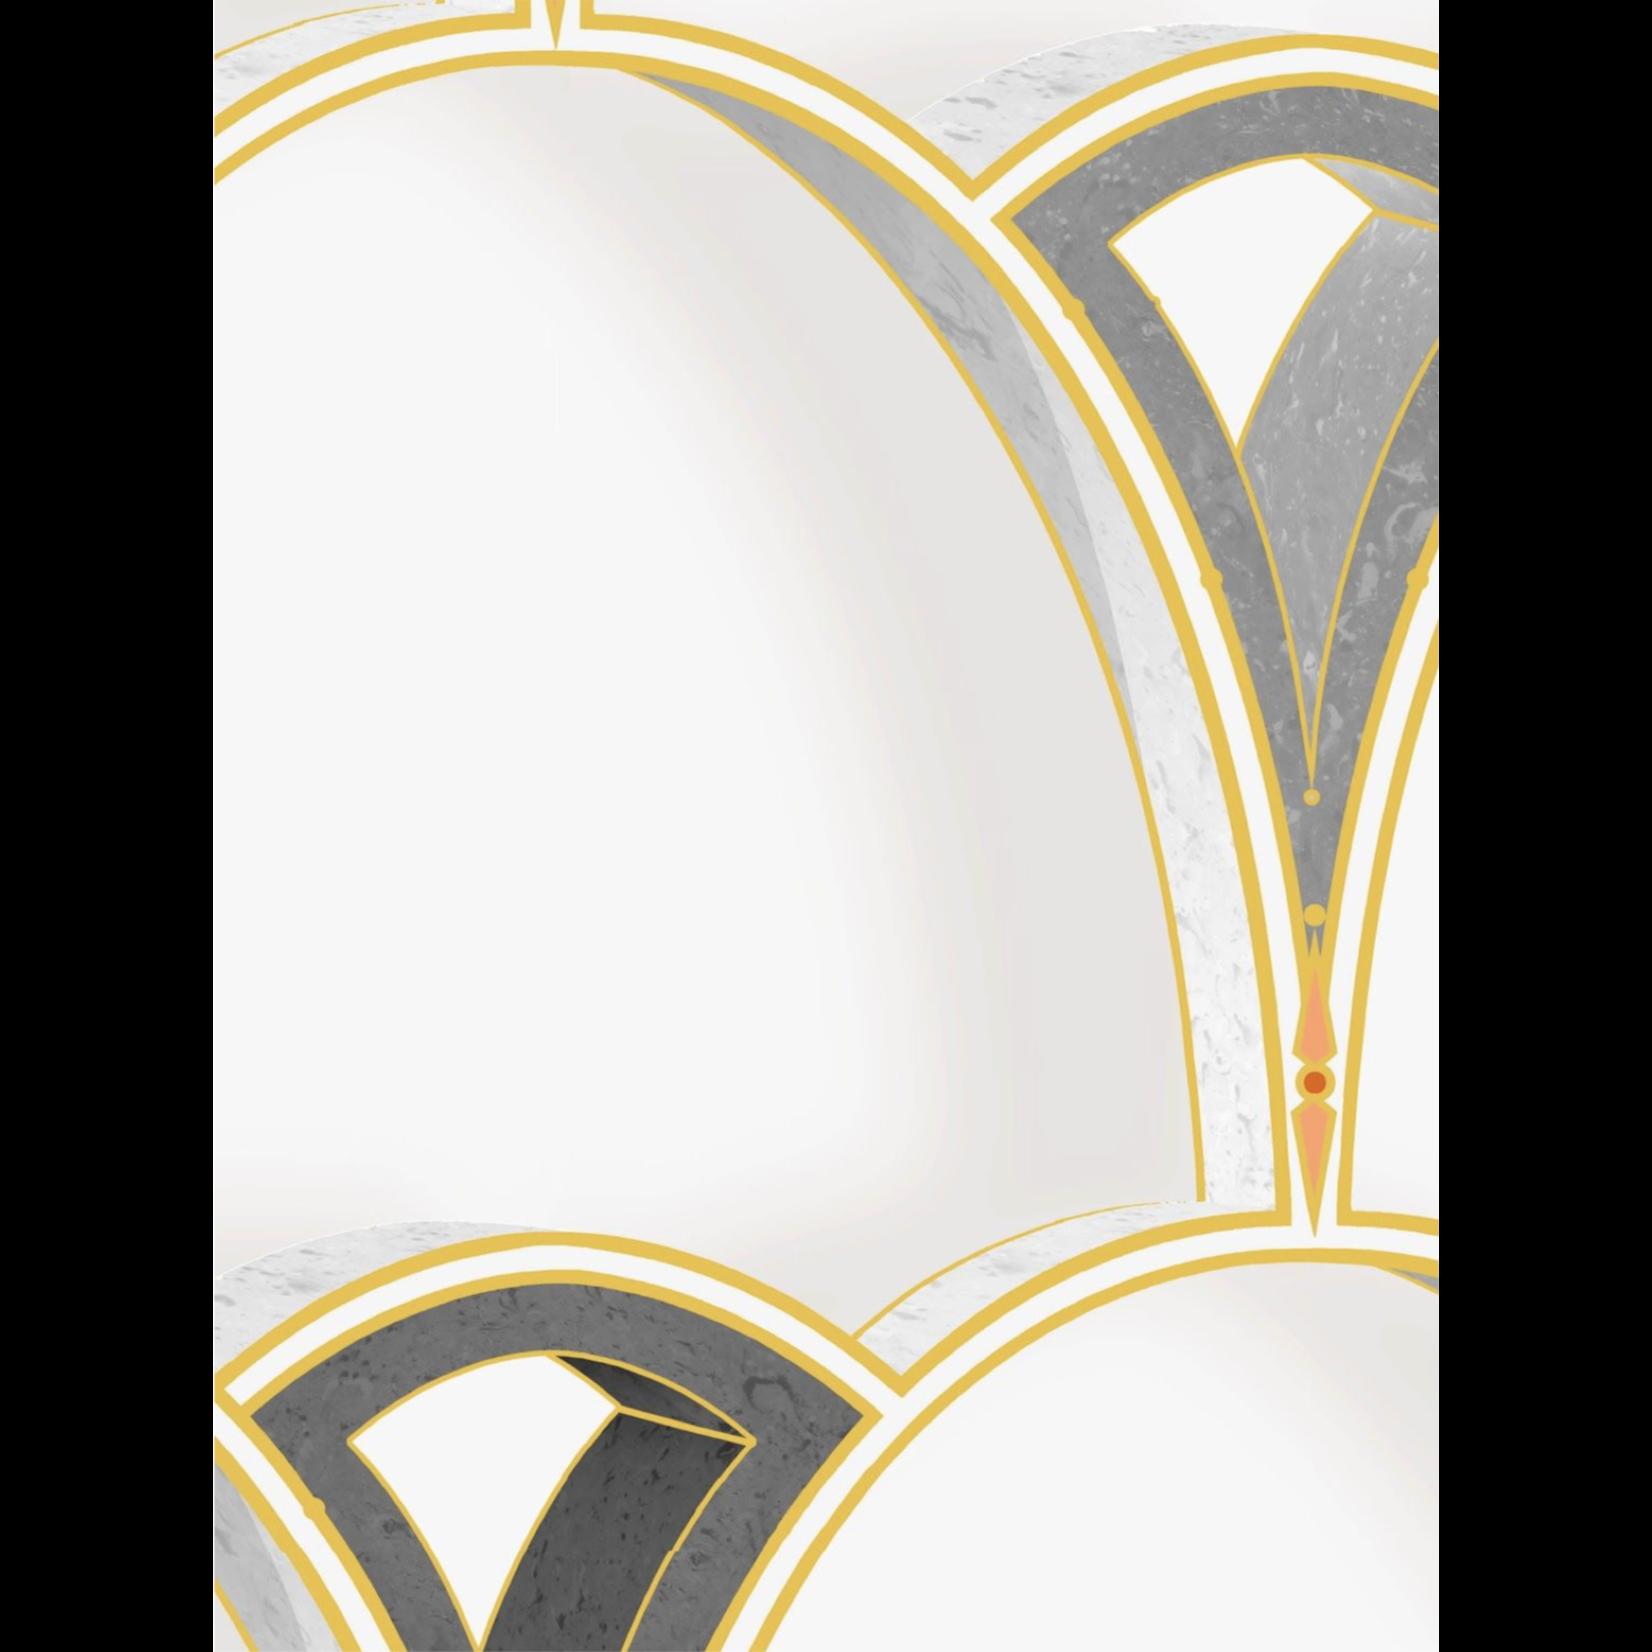 Kit Miles Tiber Archways | Gold over Slate